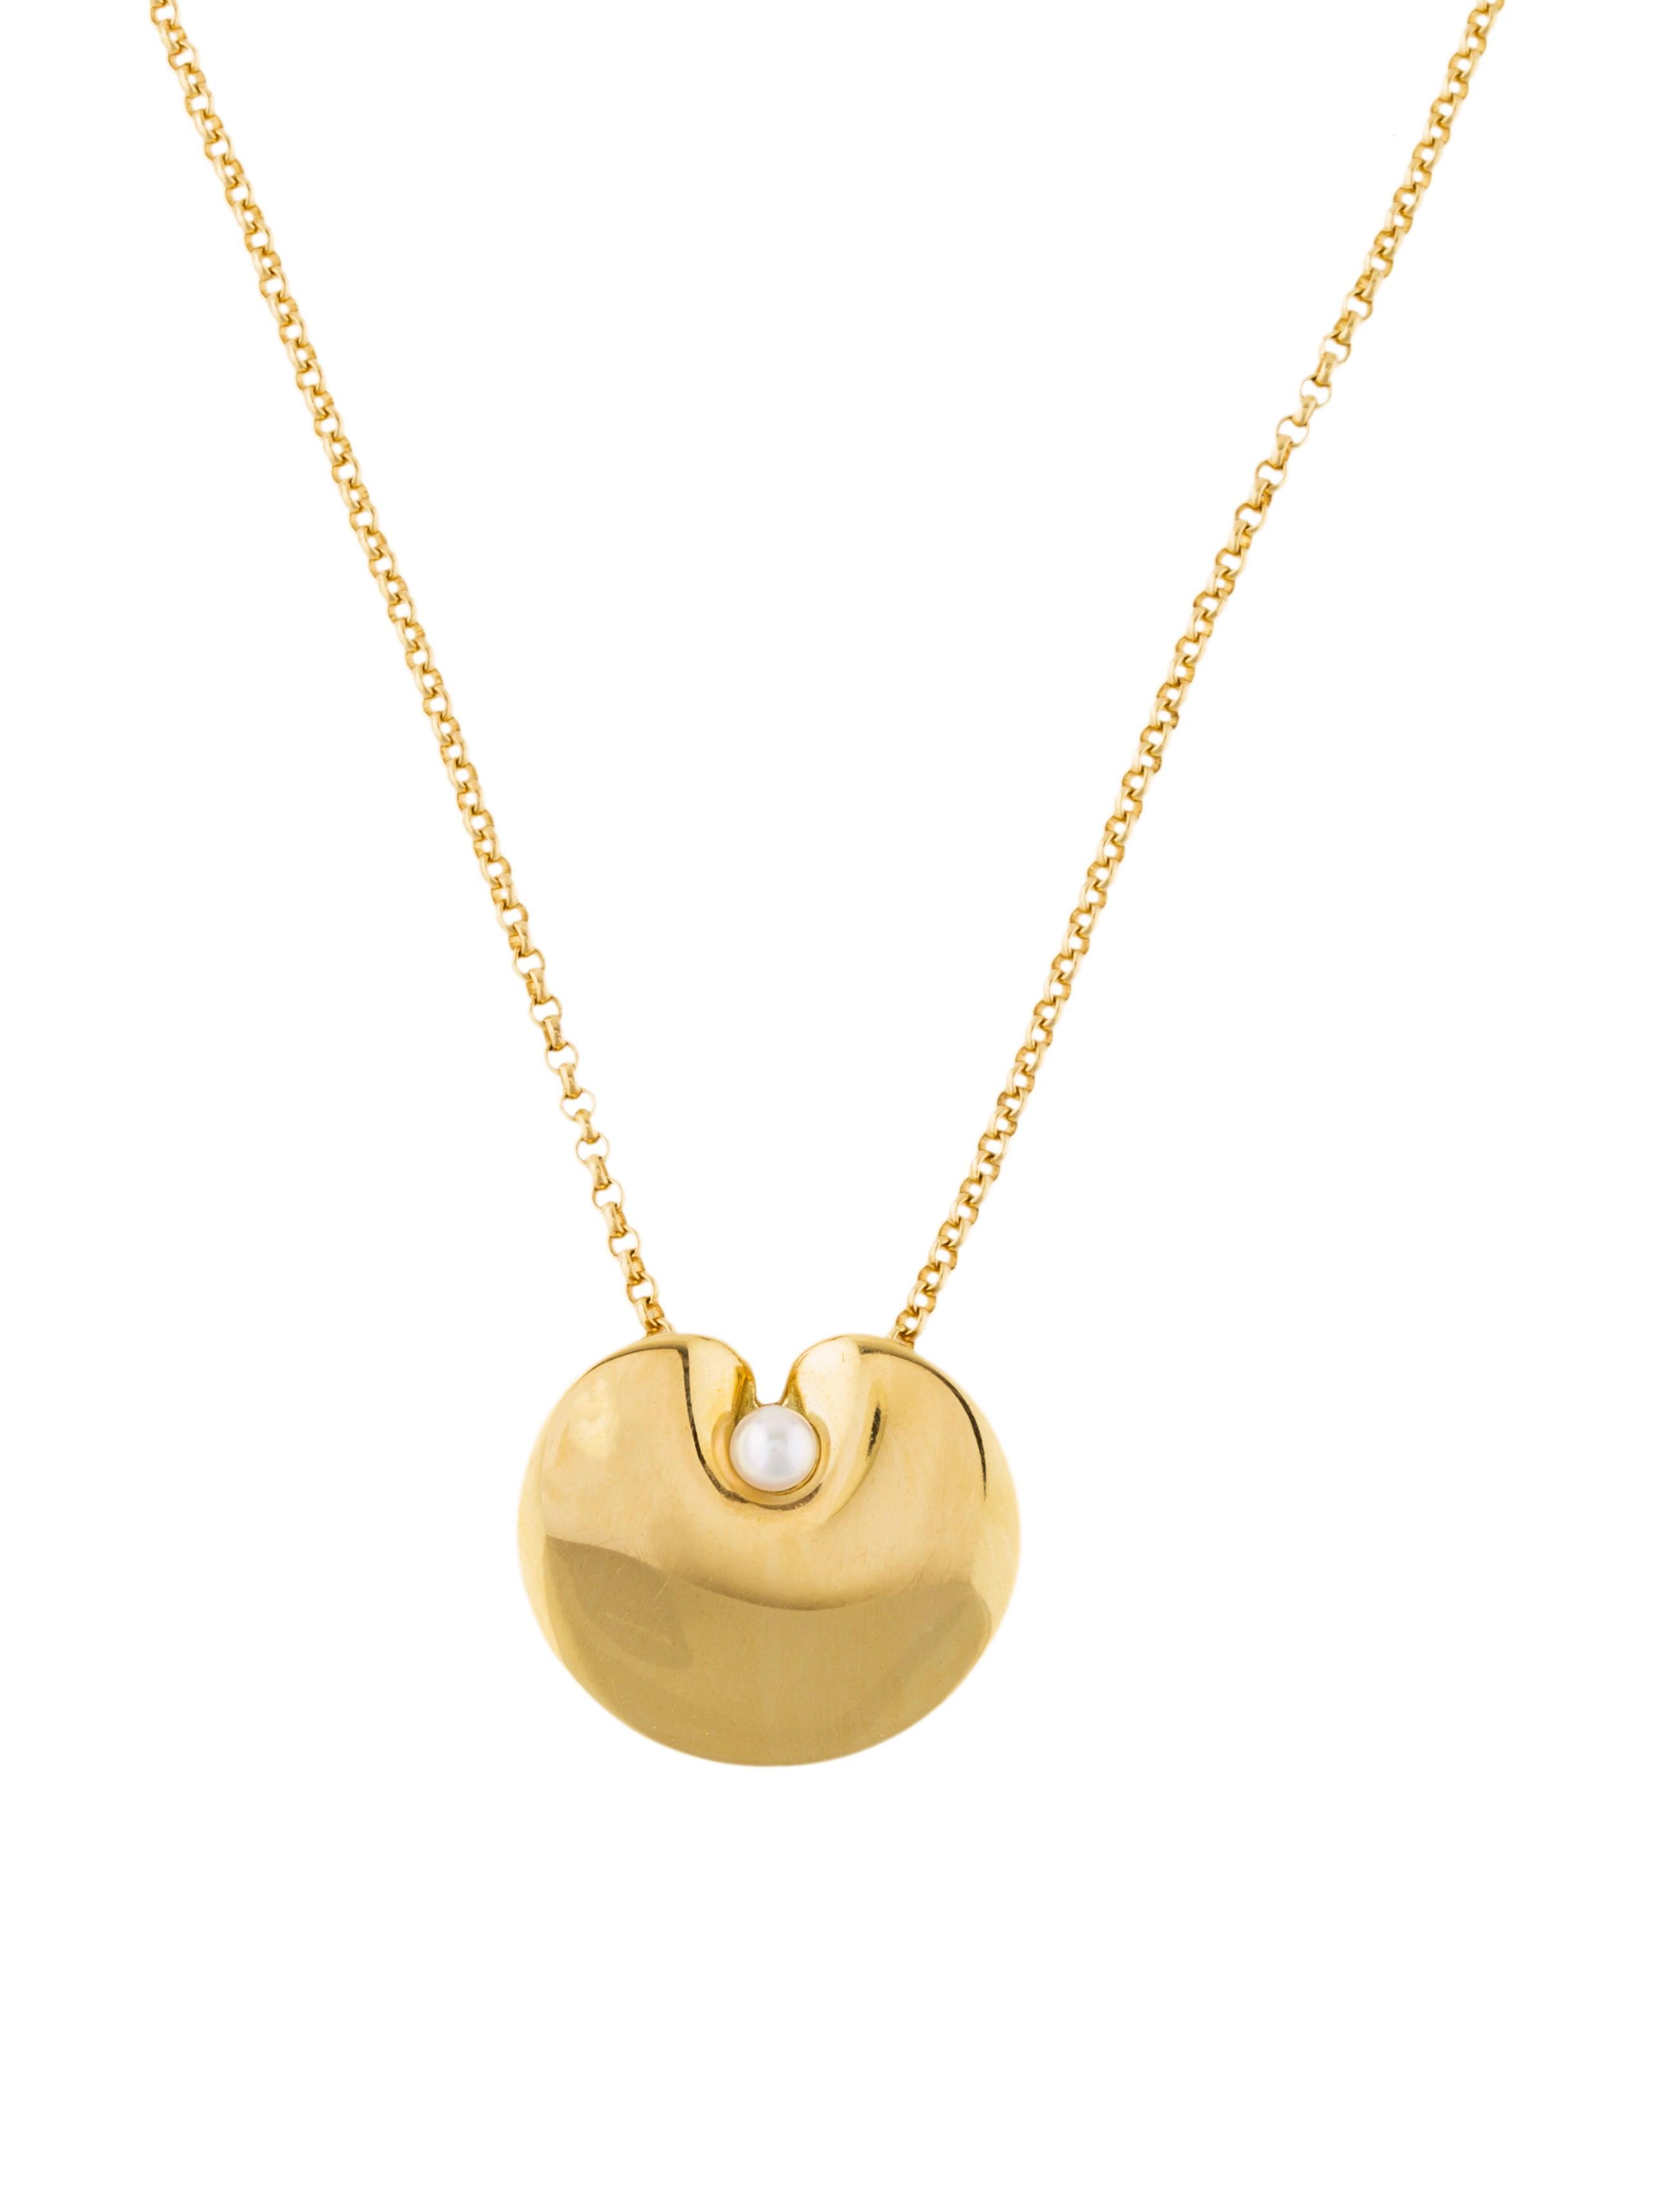 Georg Jensen X Nanna Ditzel 18K Pearl Pendant Necklace ...